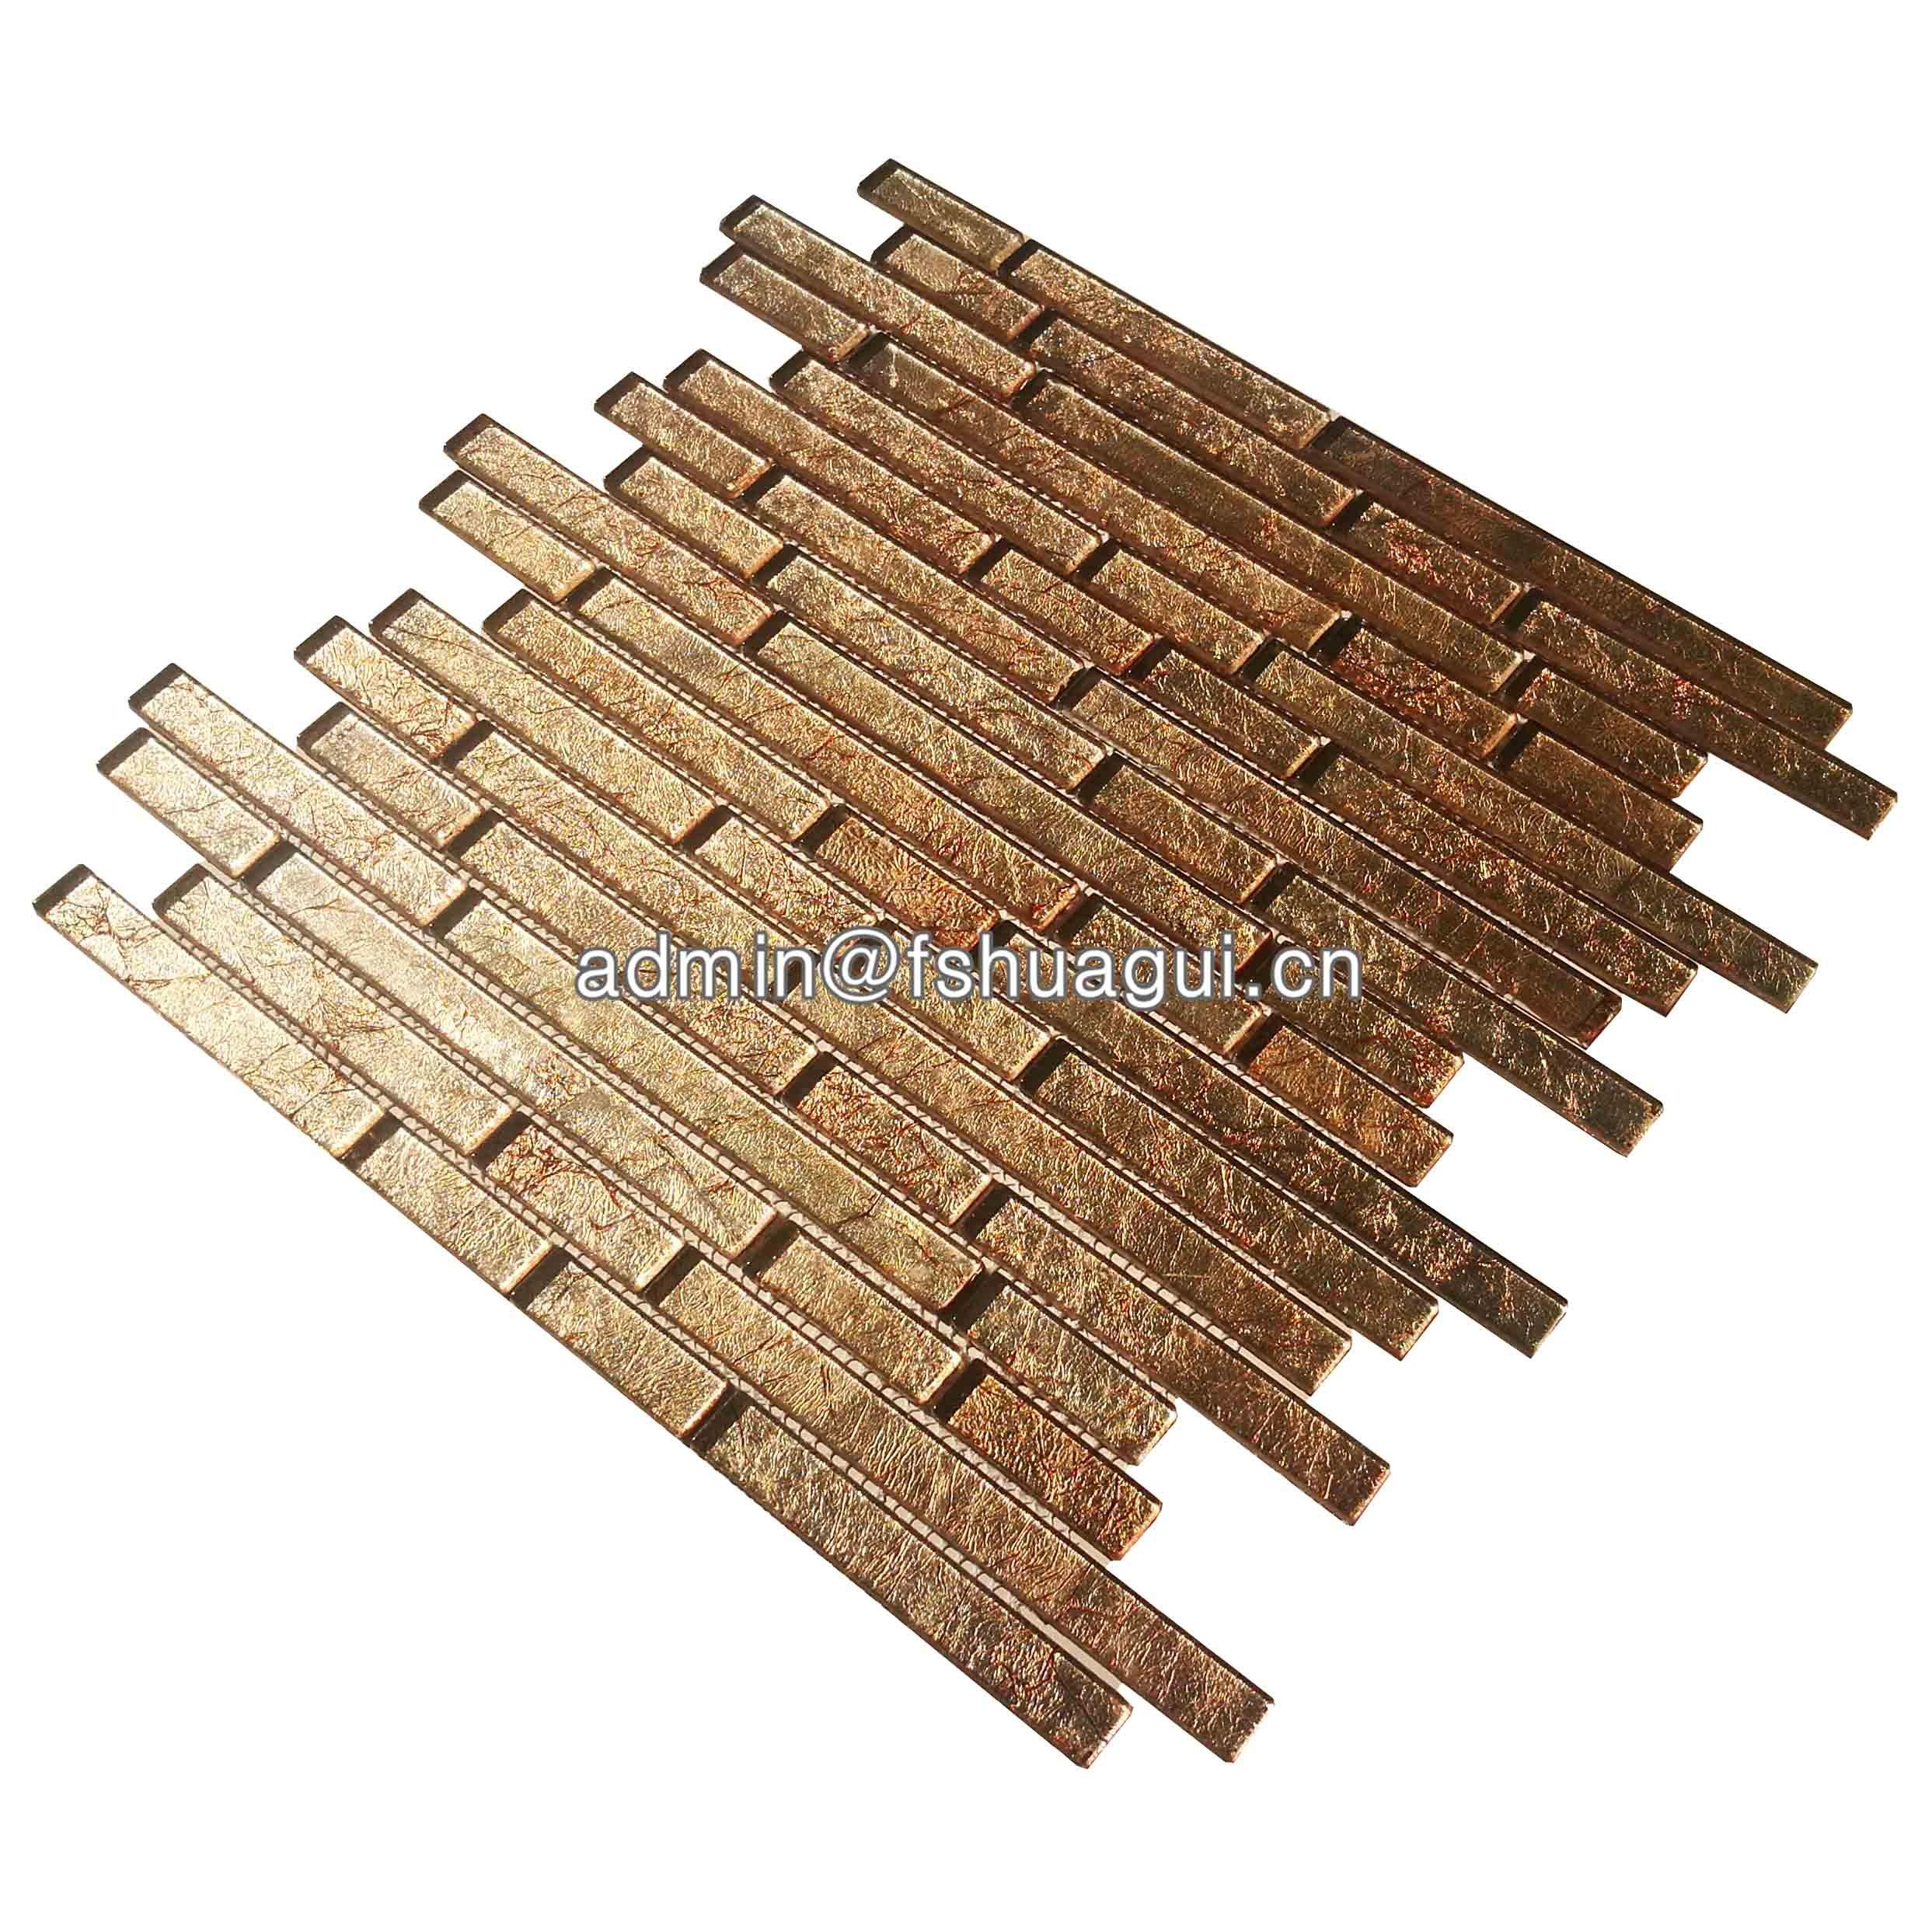 Huagui Glass Mosaic Tile HG-CDT023A GLASS MOSAIC TILE image29